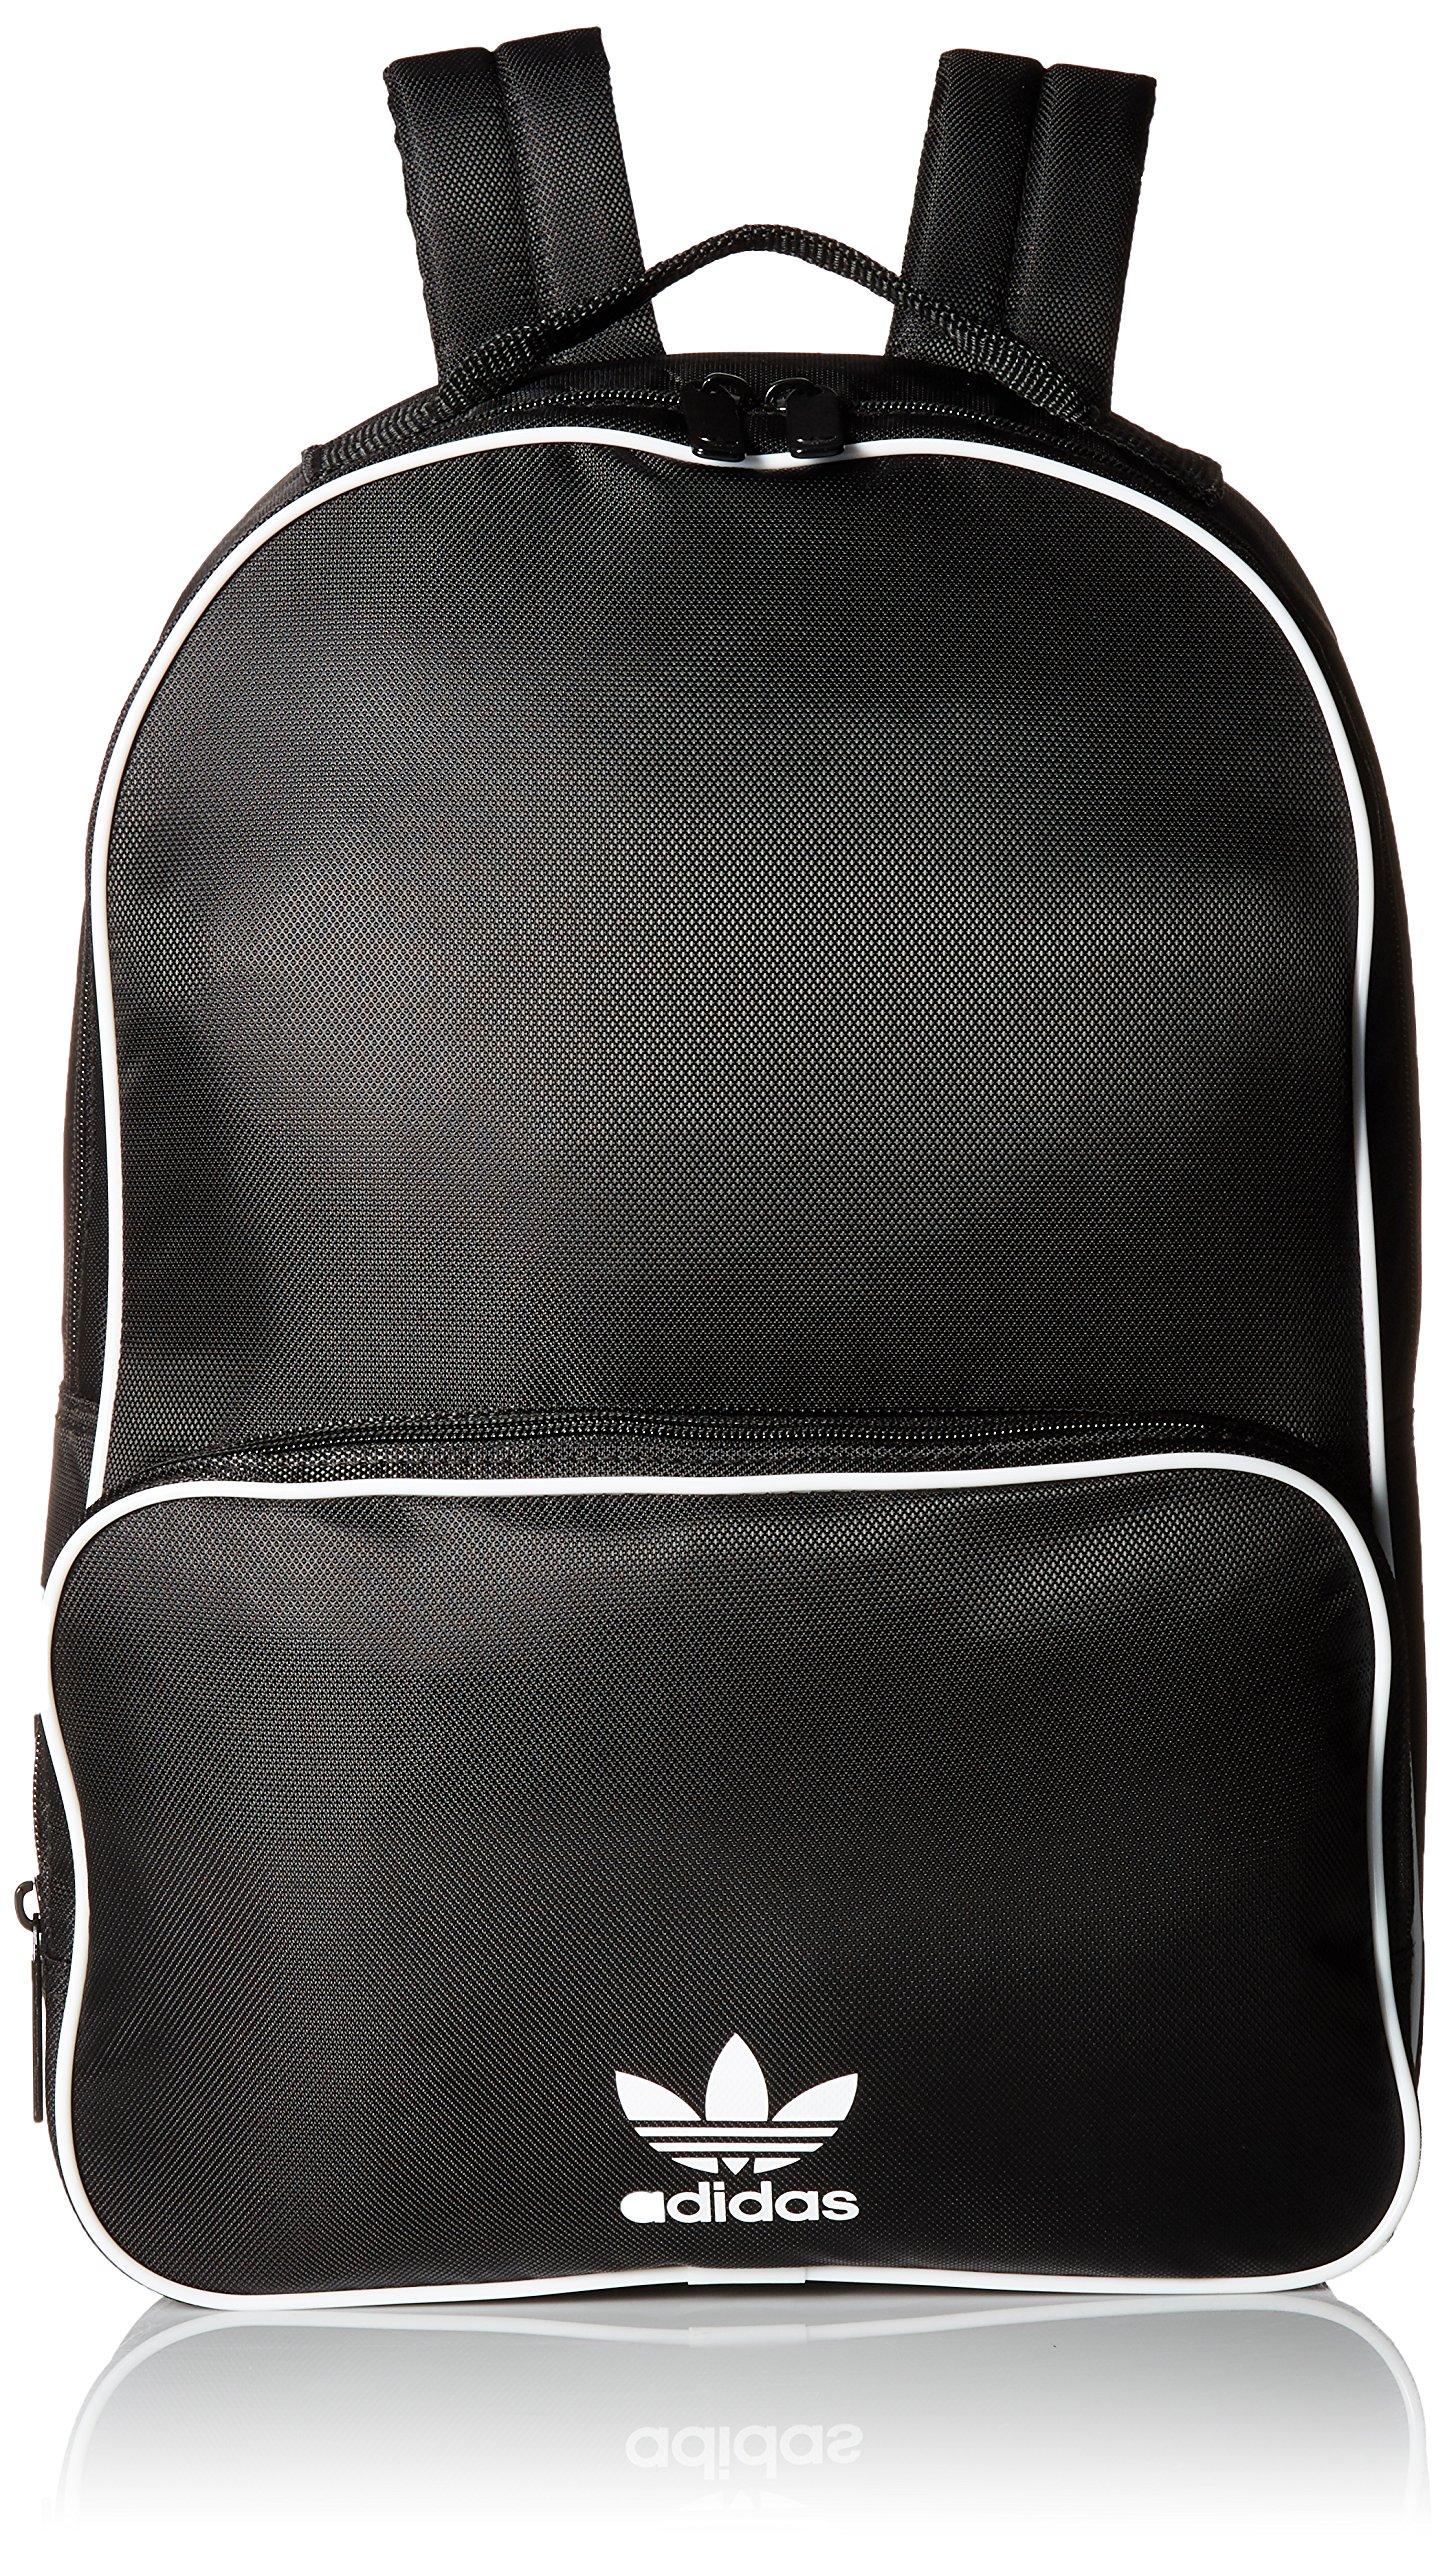 adidas Originals Santiago Backpack, Black, One Size by adidas